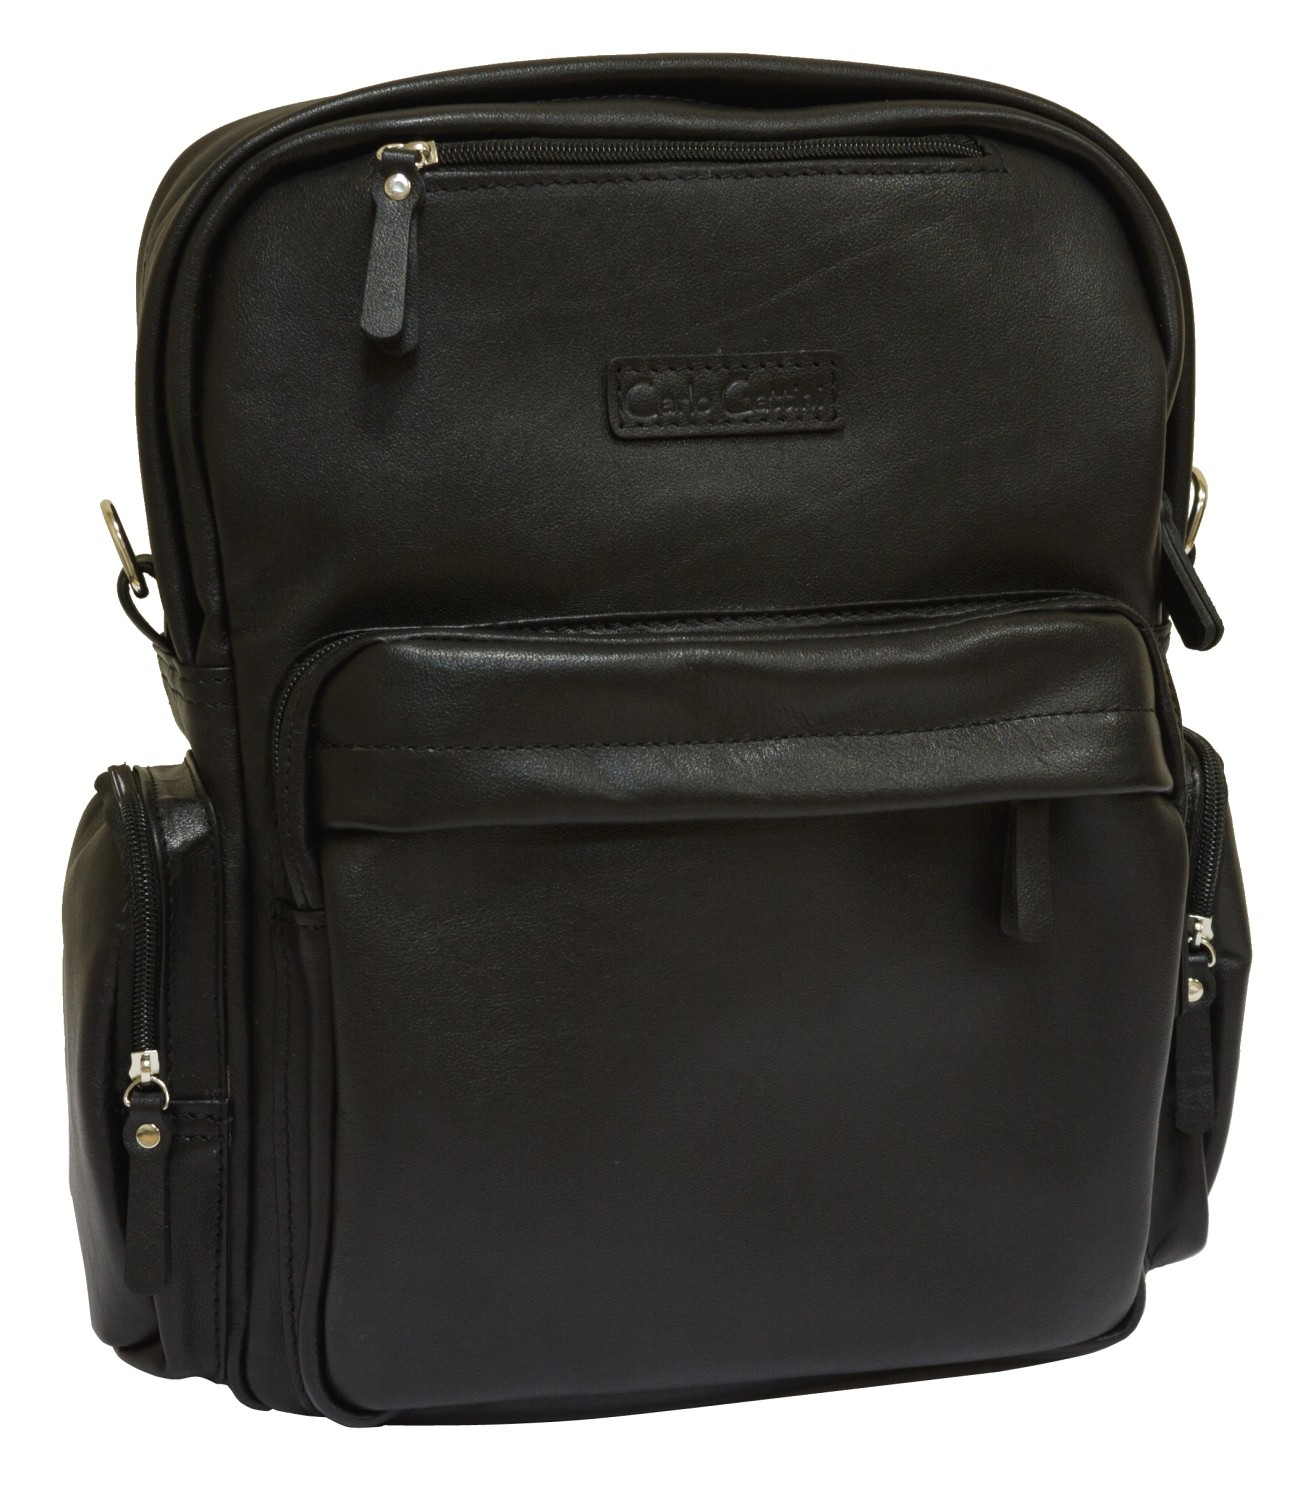 Кожаные рюкзаки carlo gattini rd-522-2 рюкзак